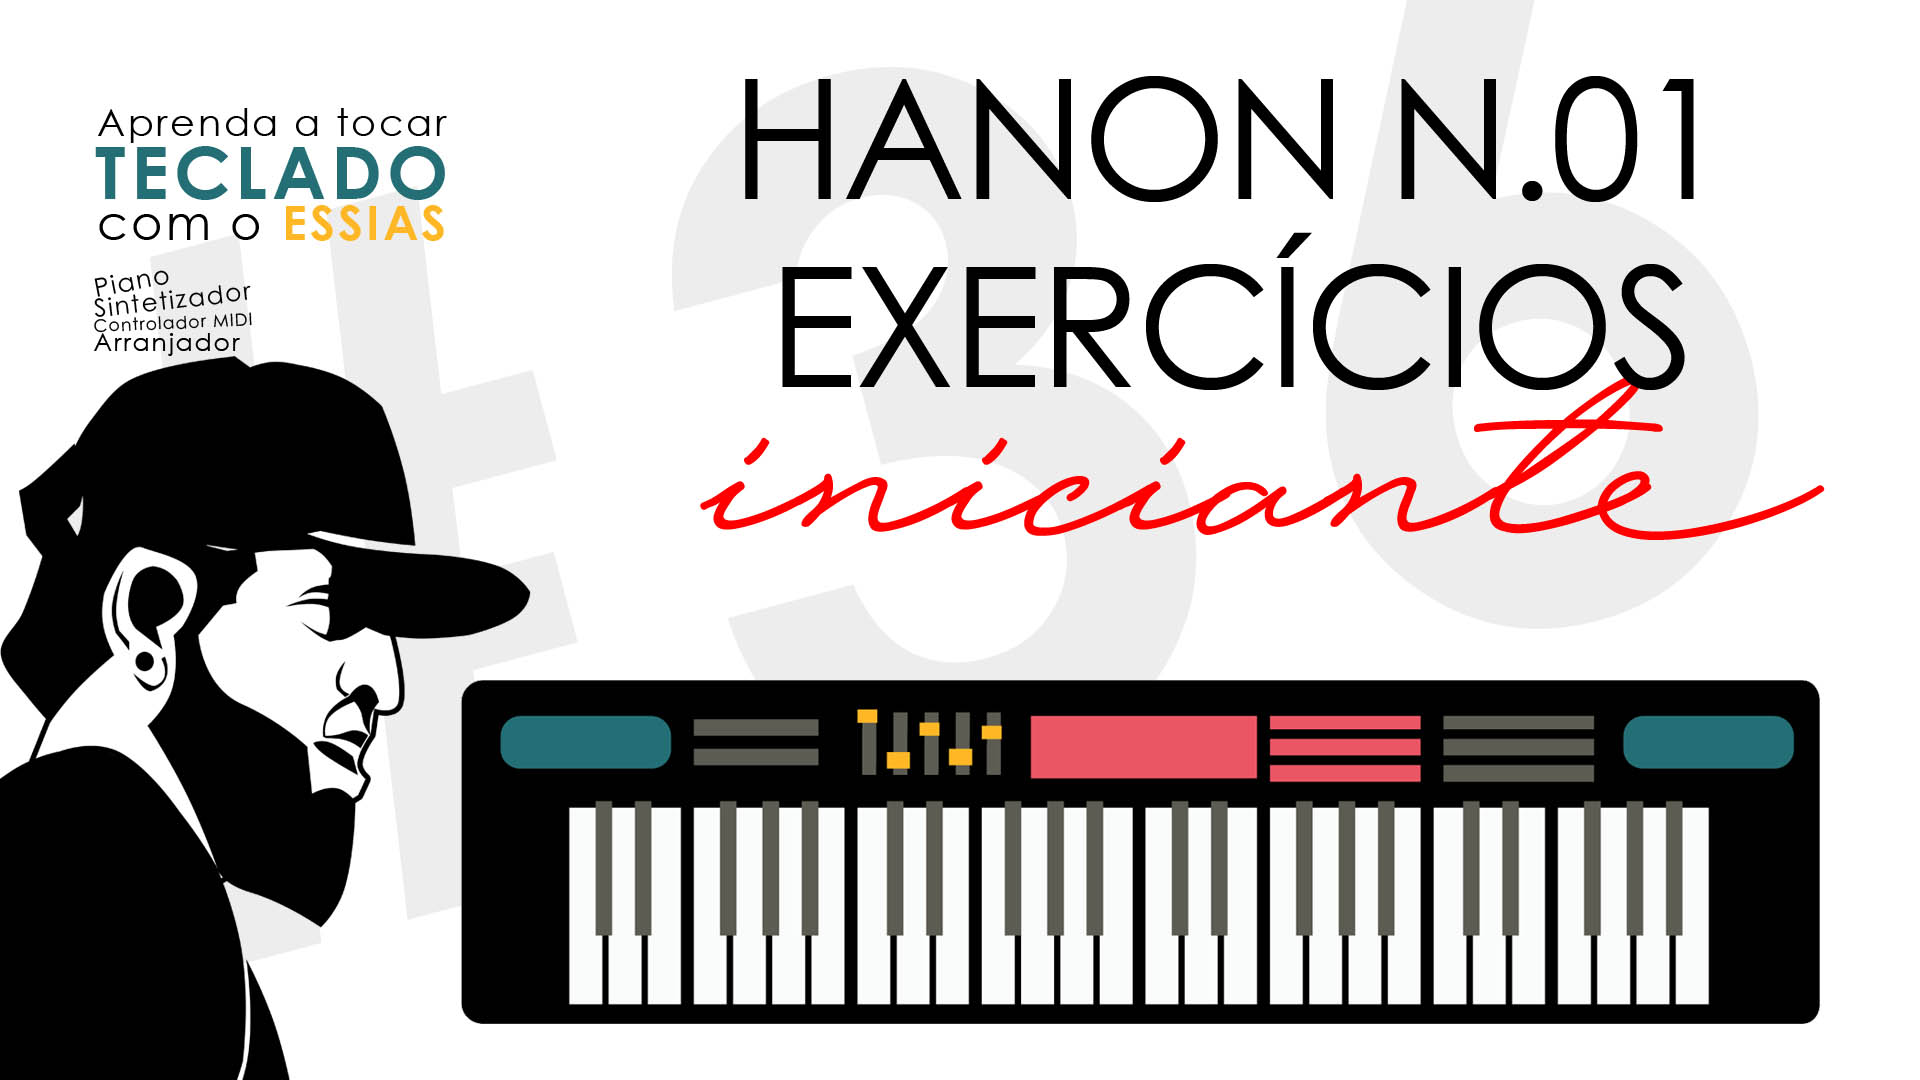 Exercícios Para Teclado – Hanon N.01 (Como Aumentar Agilidade no Teclado)